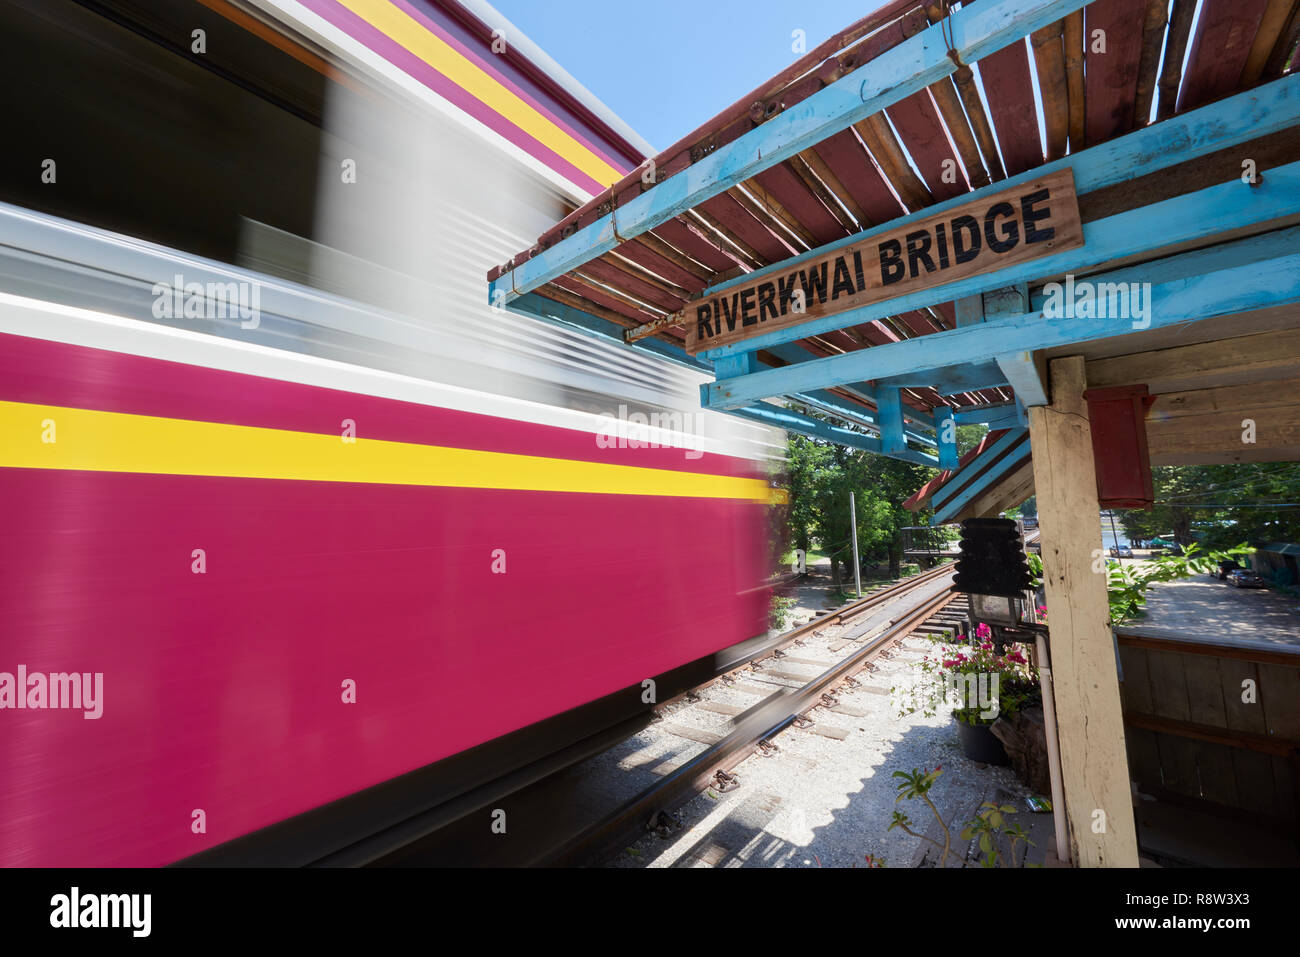 Motion-blurred train whizzes past old waiting gazibo of the Siam-Burma Railway over River Kwai in Kanchanaburi, Thailand. The infamous River Kwai brid Stock Photo